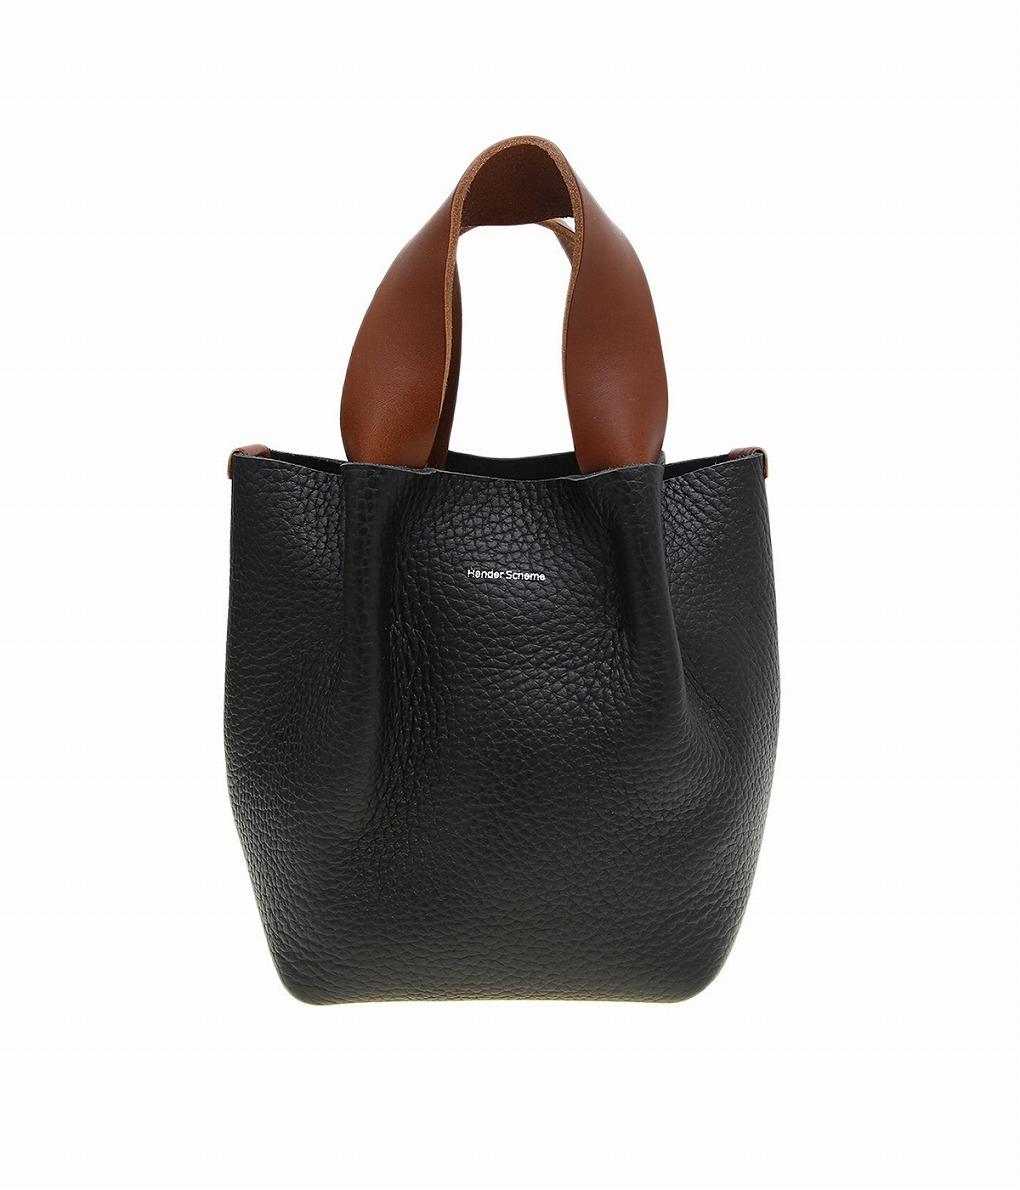 Hender Scheme / エンダースキーマ : piano bag small / 全3色 : ピアノ バッグ スモール 鞄 トート バッグ レザー 本革 牛革 ユニセックス : mj-rb-pis【ANN】【BJB】